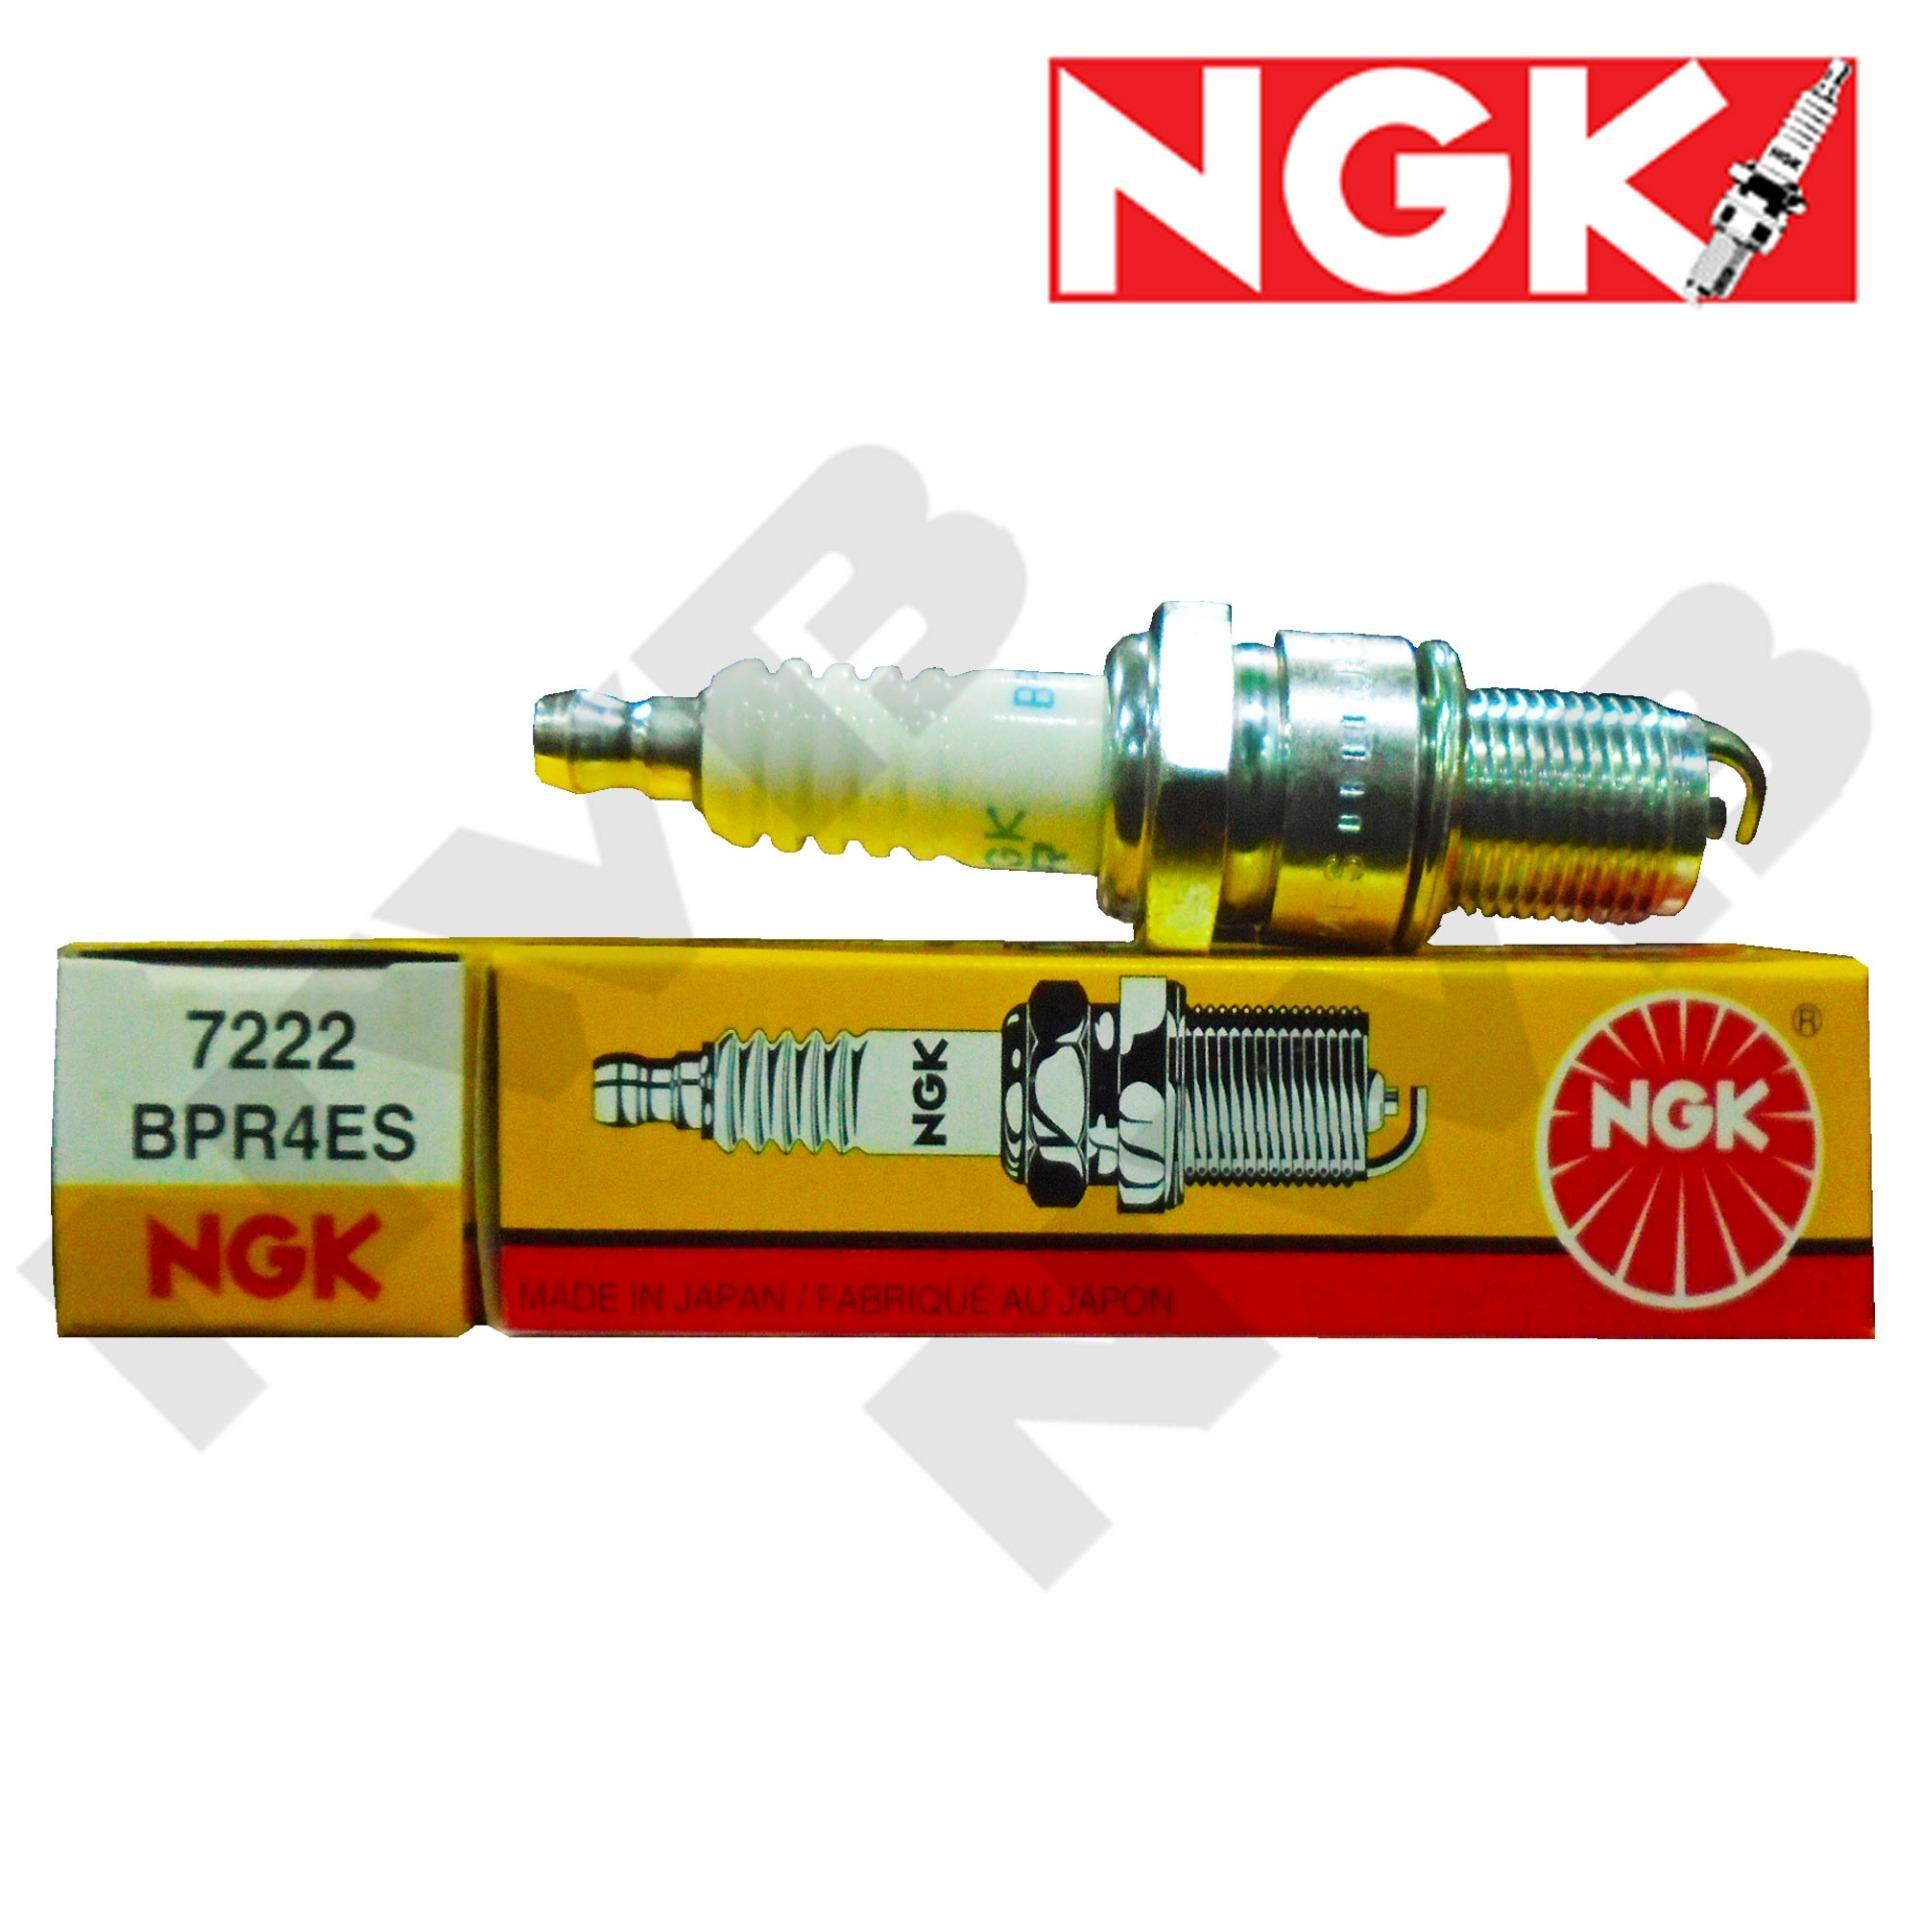 Ngk Bpr4es Spark Plug By Nwb Wiper Blade.